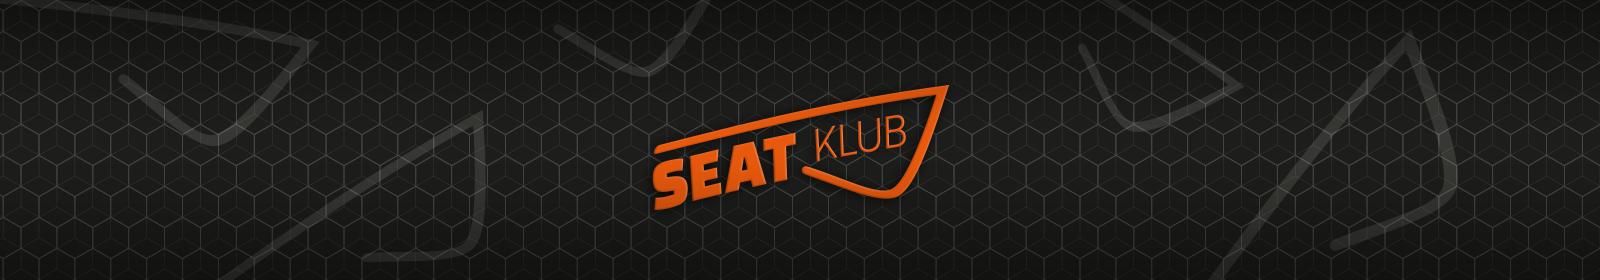 SEAT-forum.cz hlavni logo